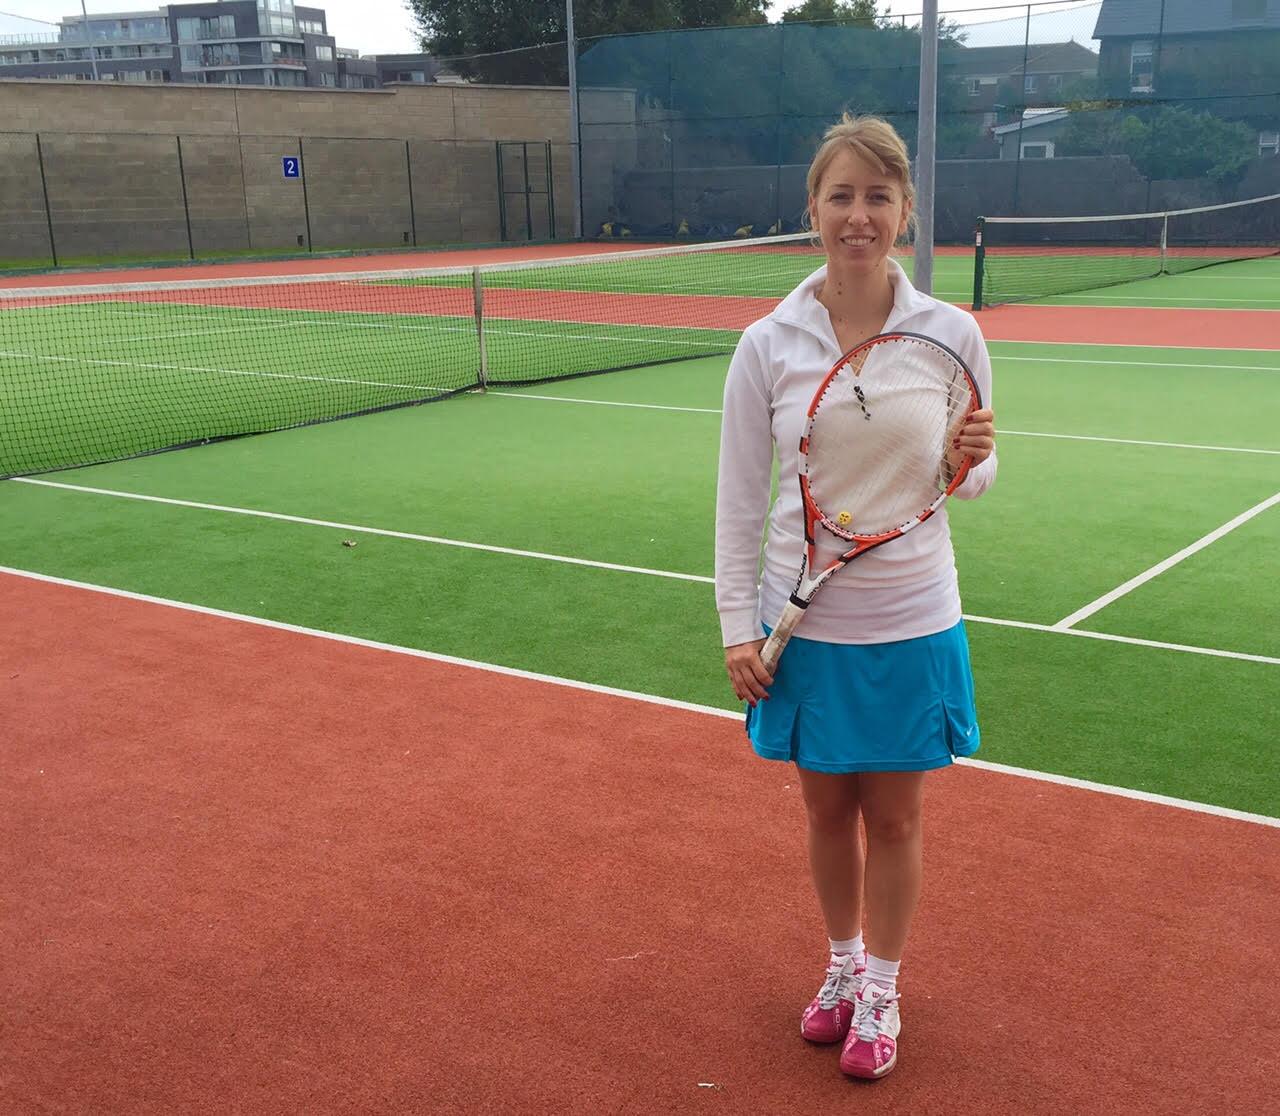 Vanessa Boschetti playing tennis Dublin